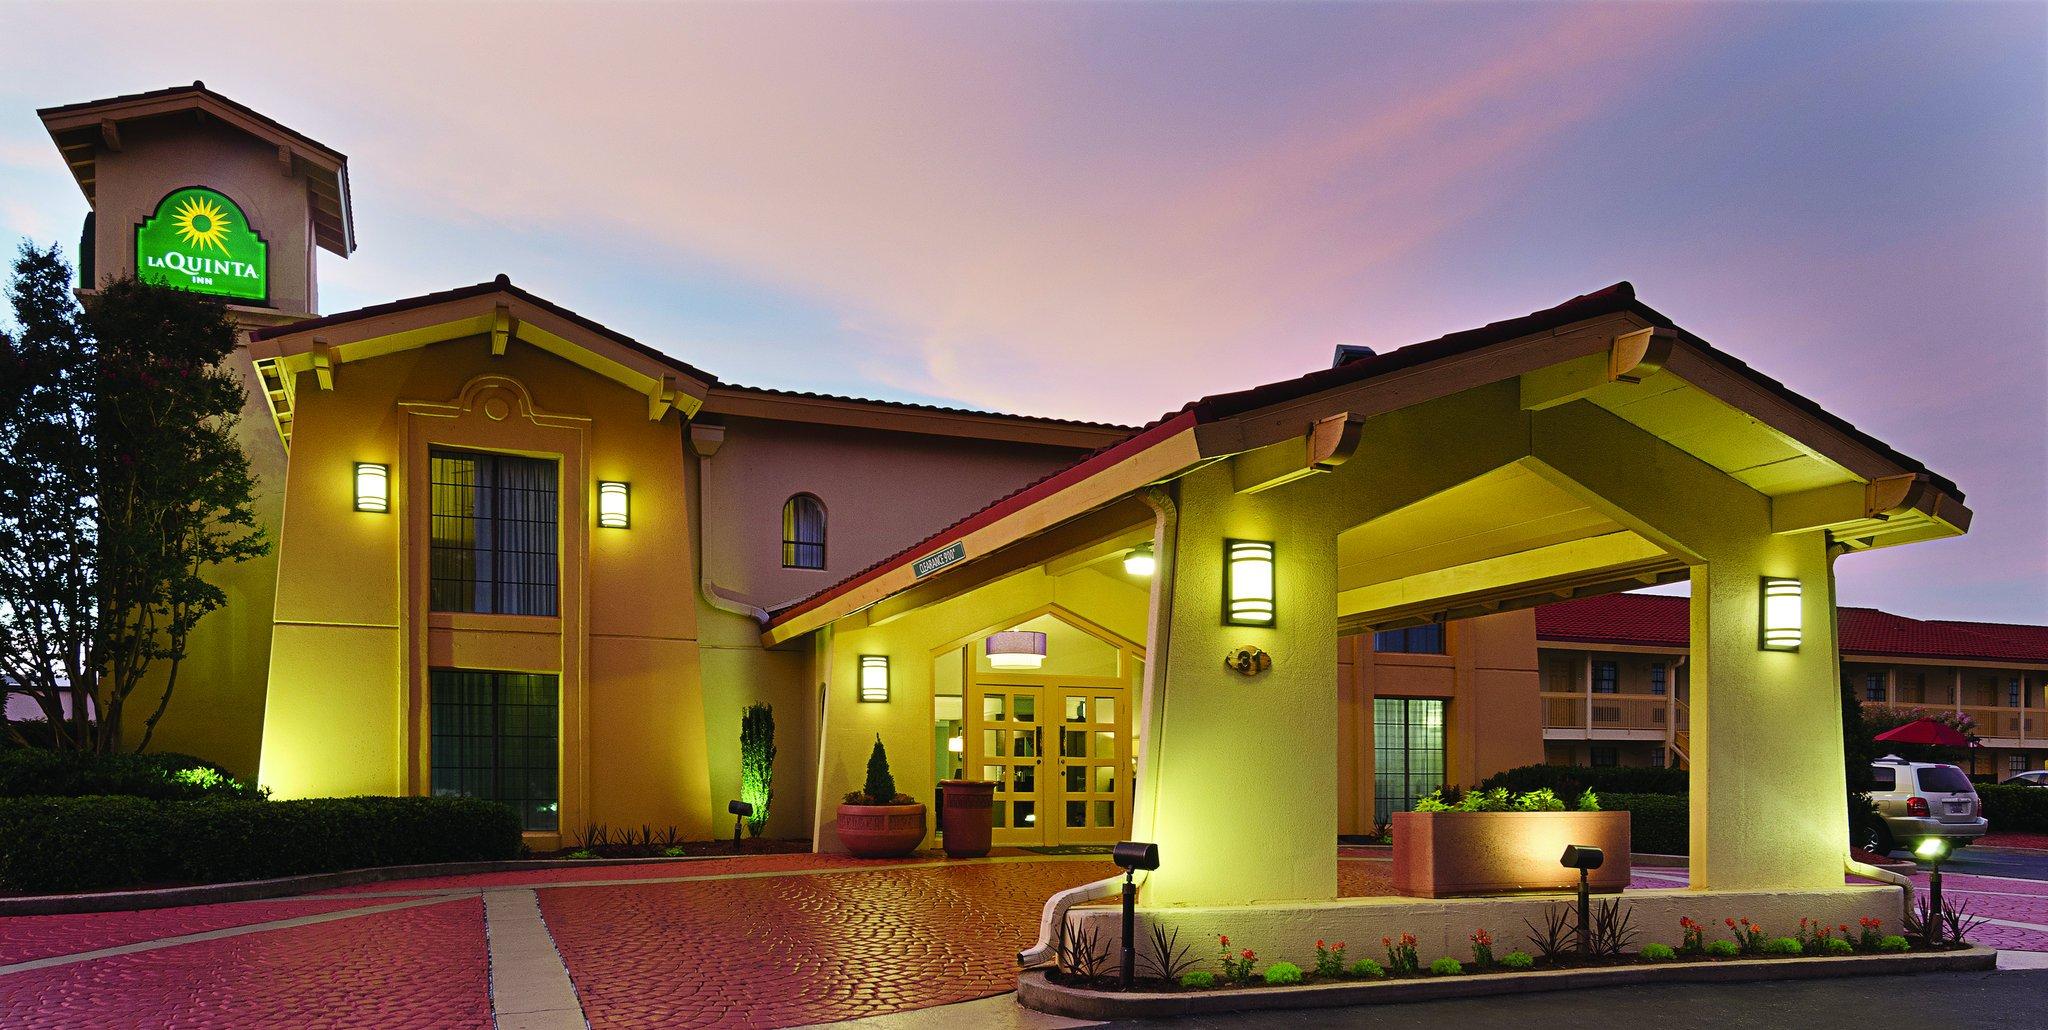 Baymont Inn & Suites Greenville Woodruff Rd